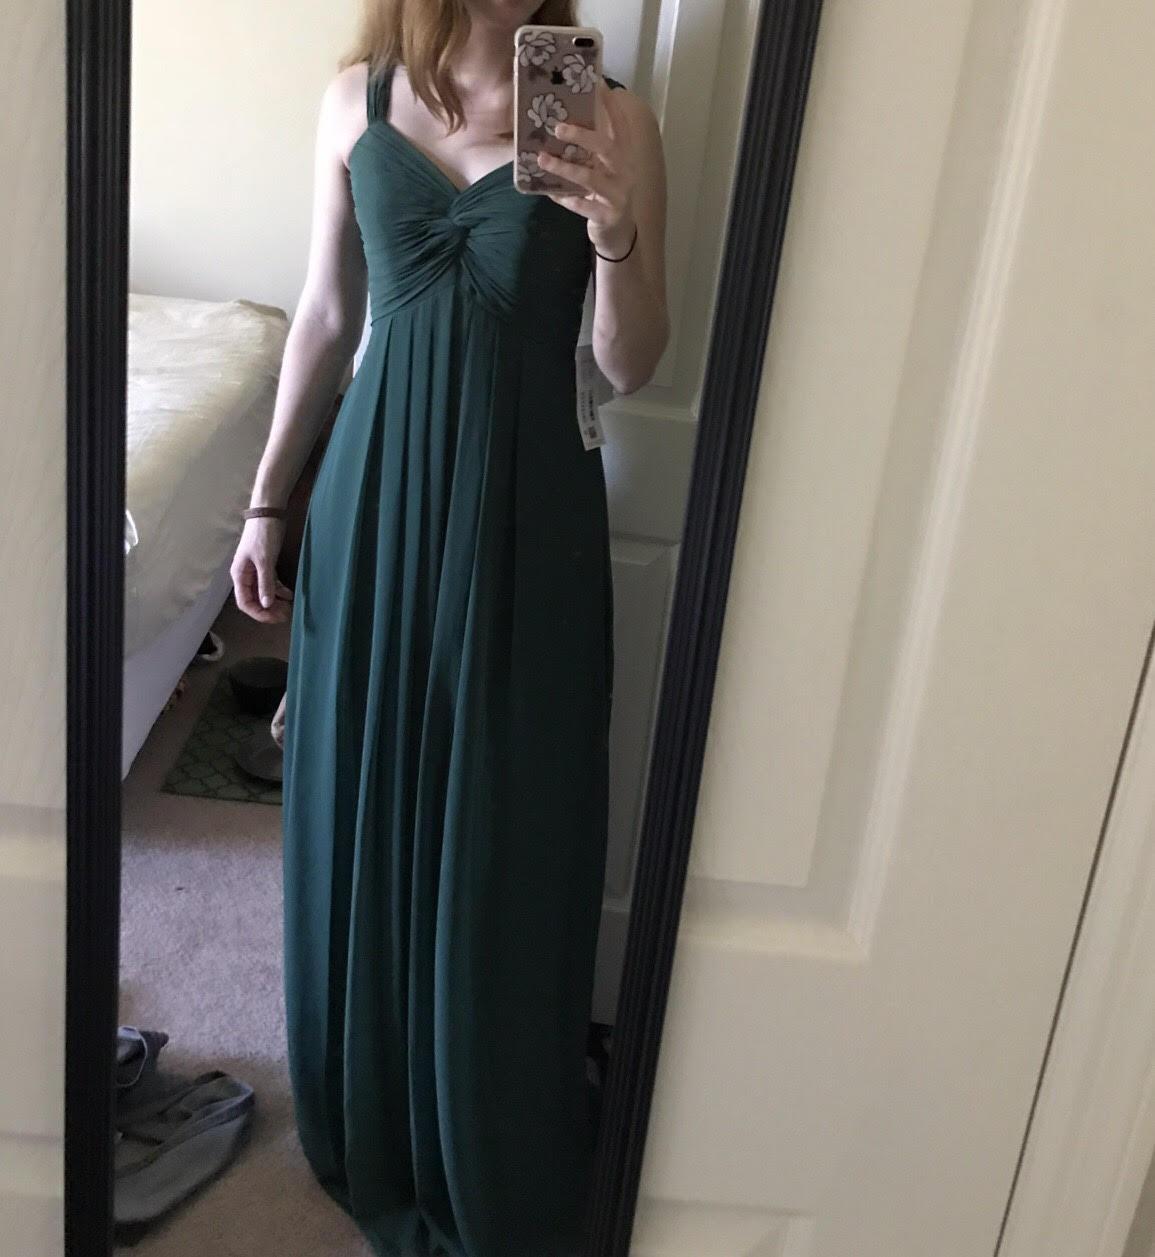 1c6883e174a Azazie Kaitlynn Bridesmaid Dress - Lavender